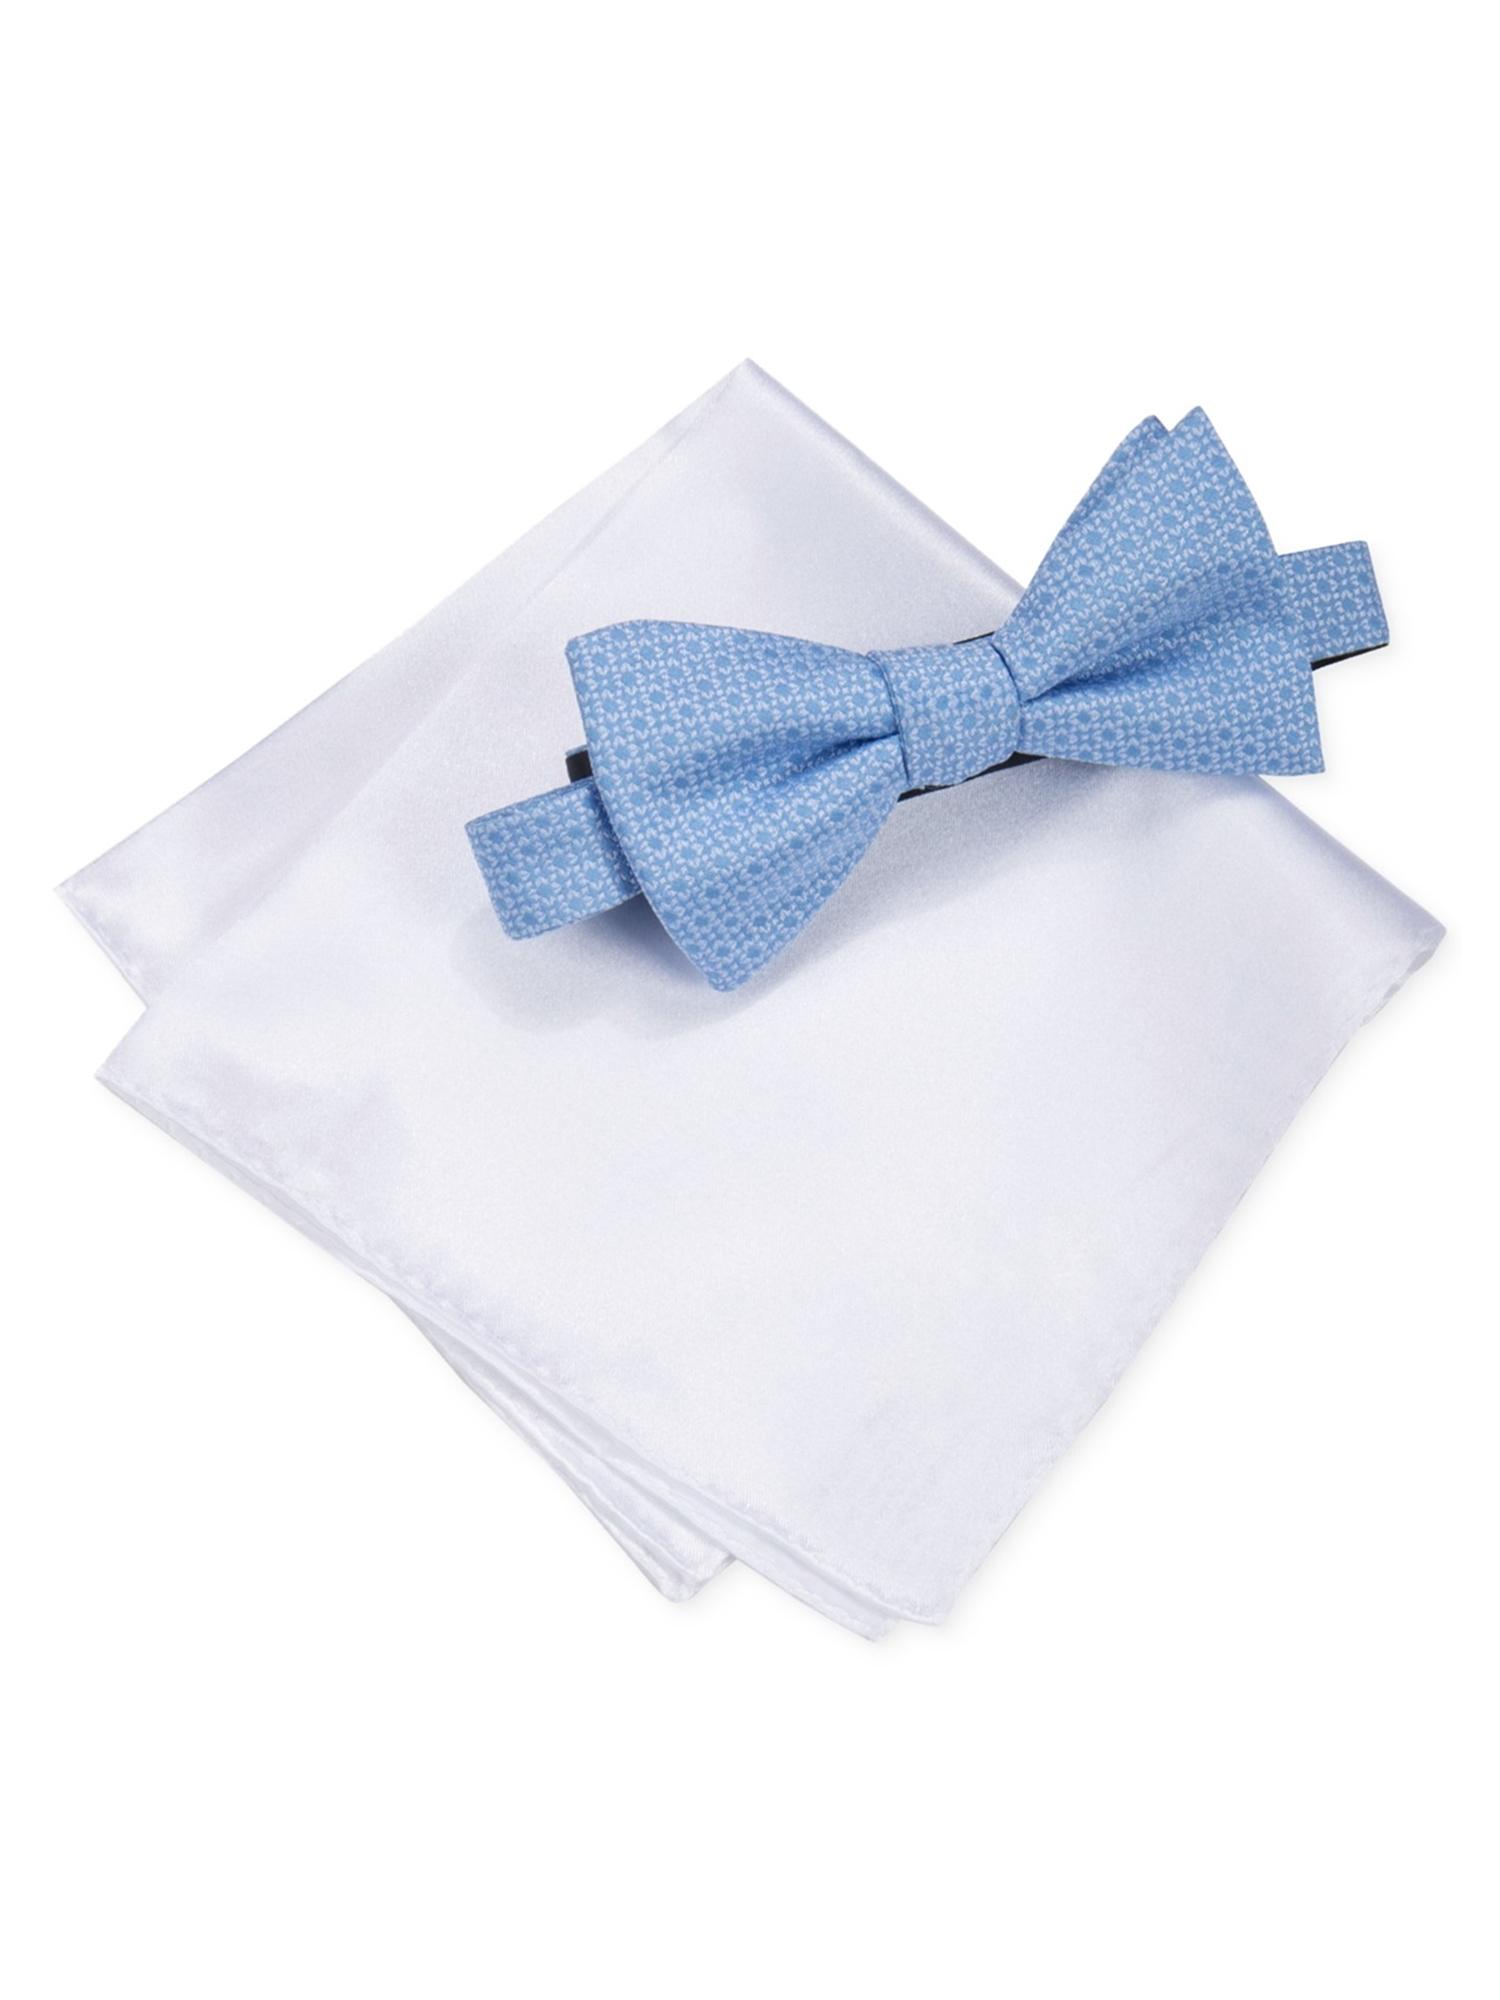 Alfani Mens Pocket Square Set Self-tied Bow Tie